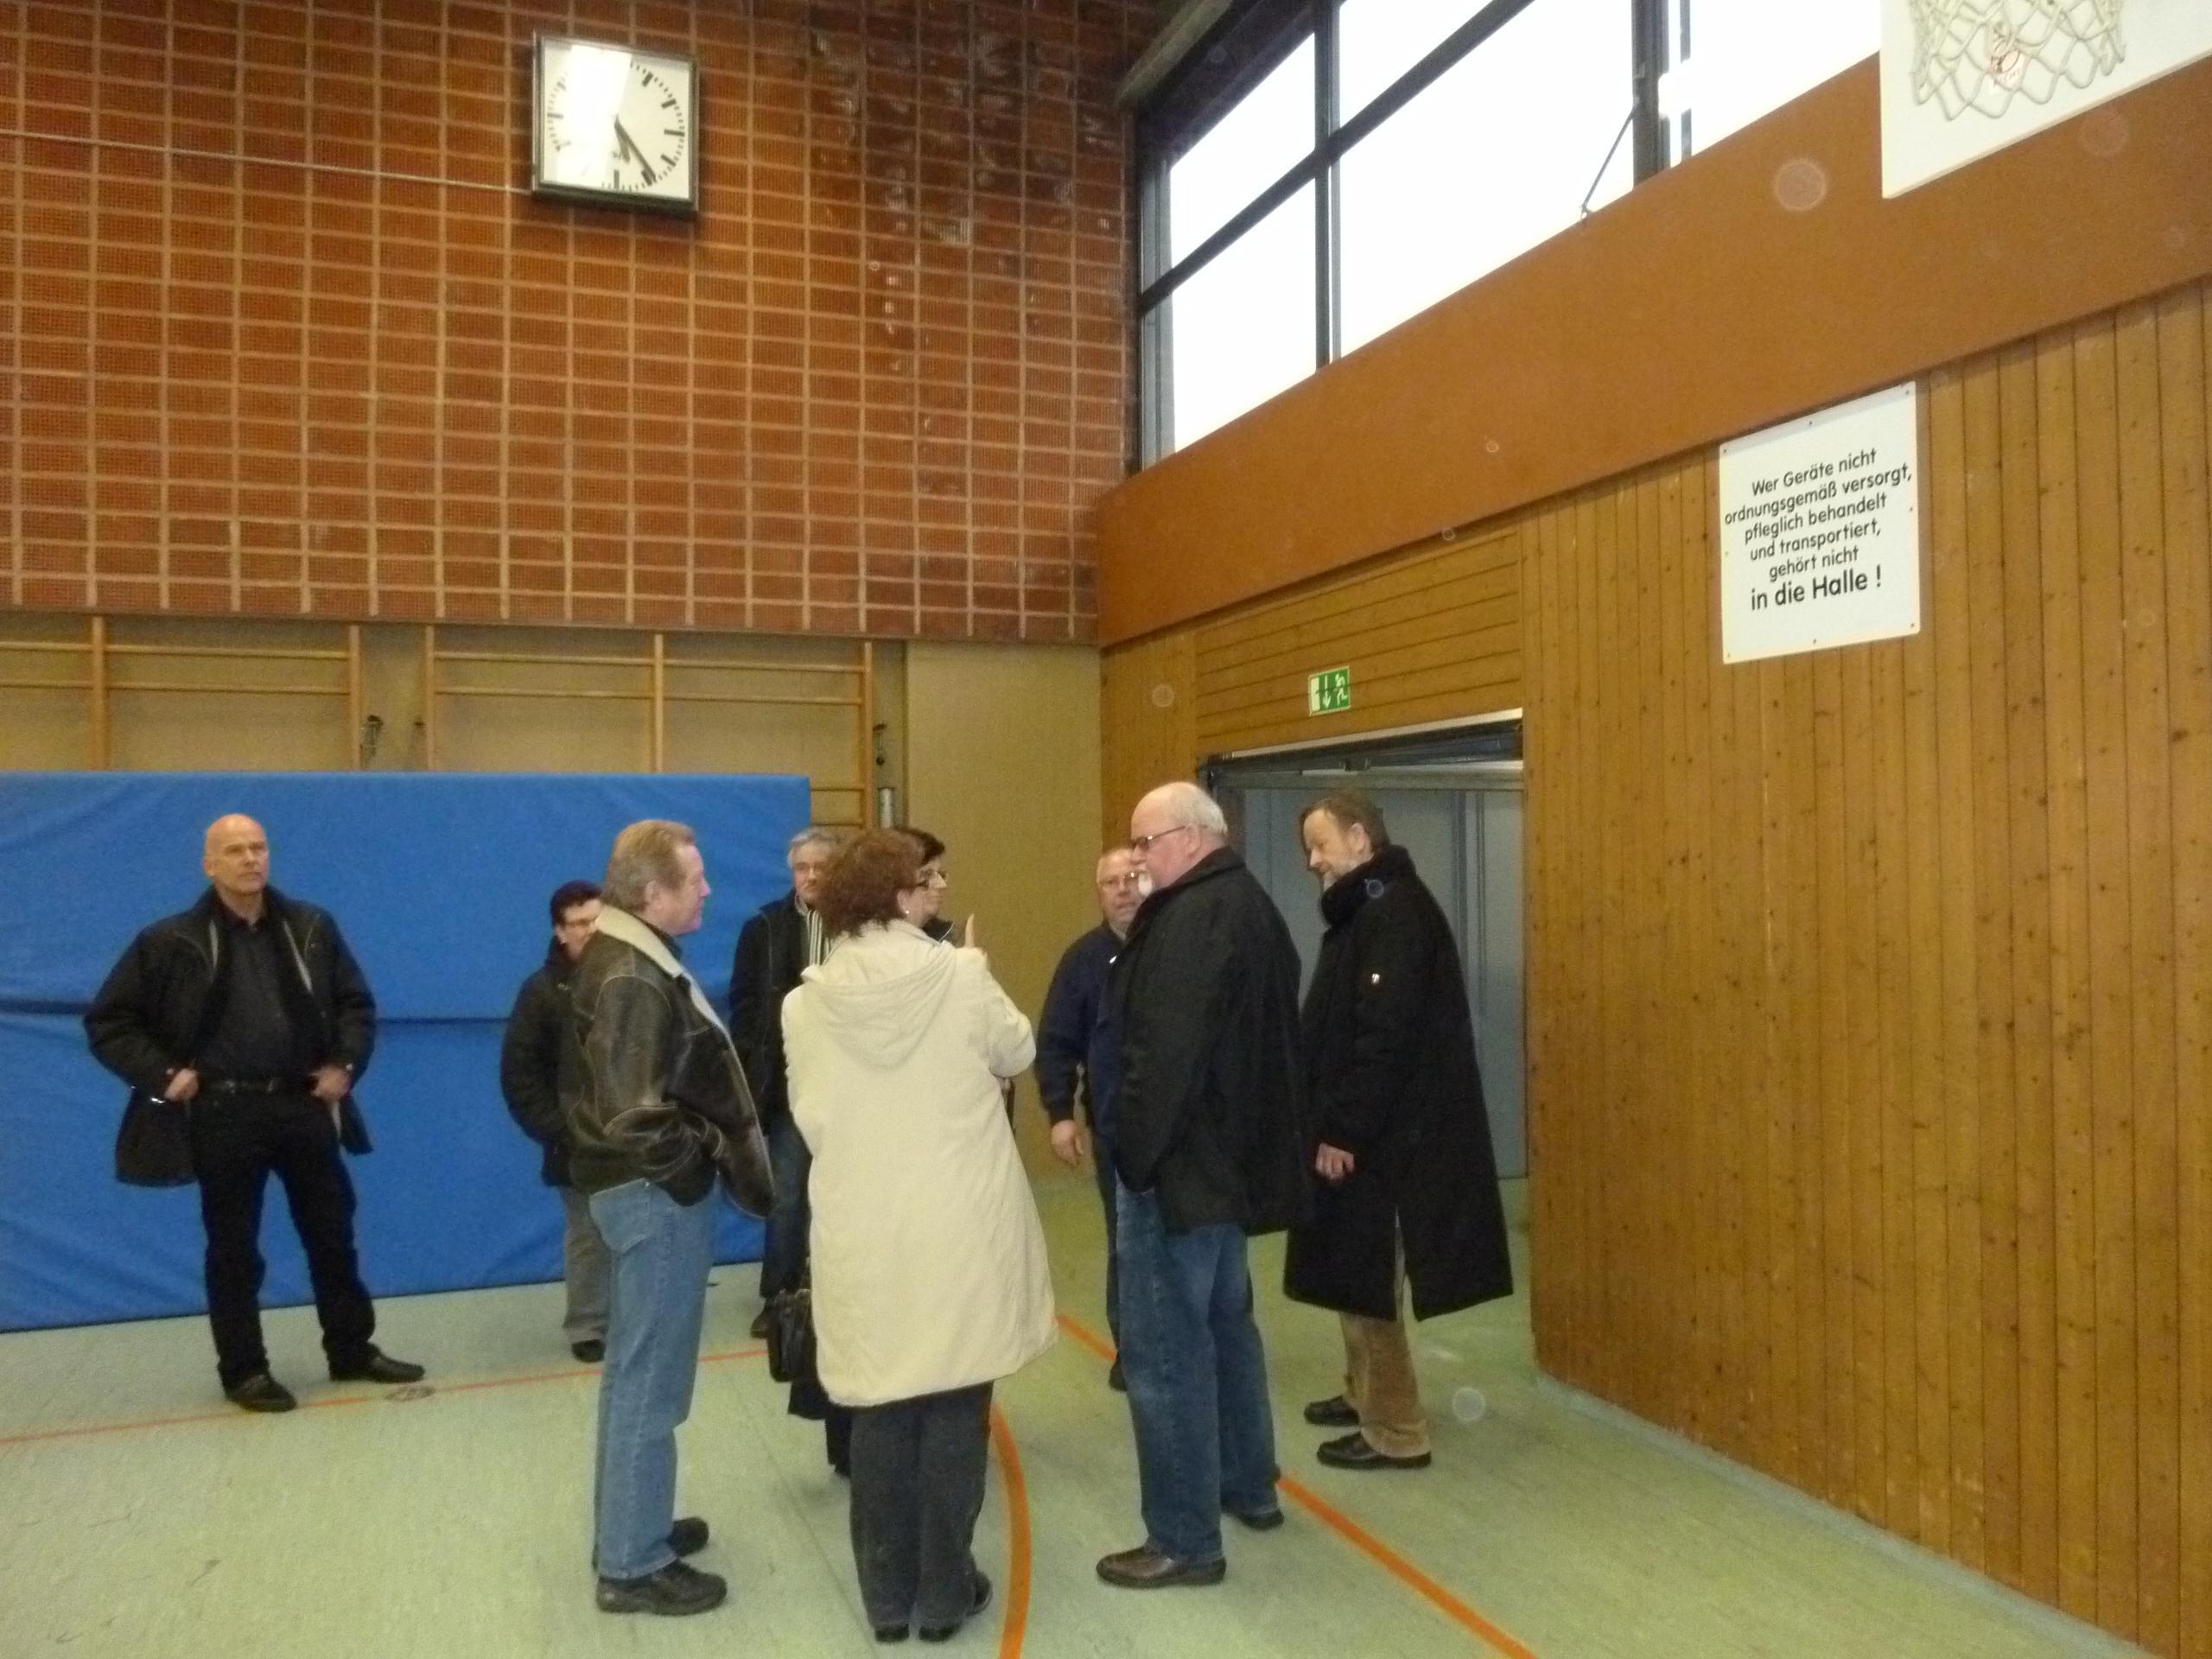 CDU-Fraktion Besichtigung Möhringer Sporthalle 01